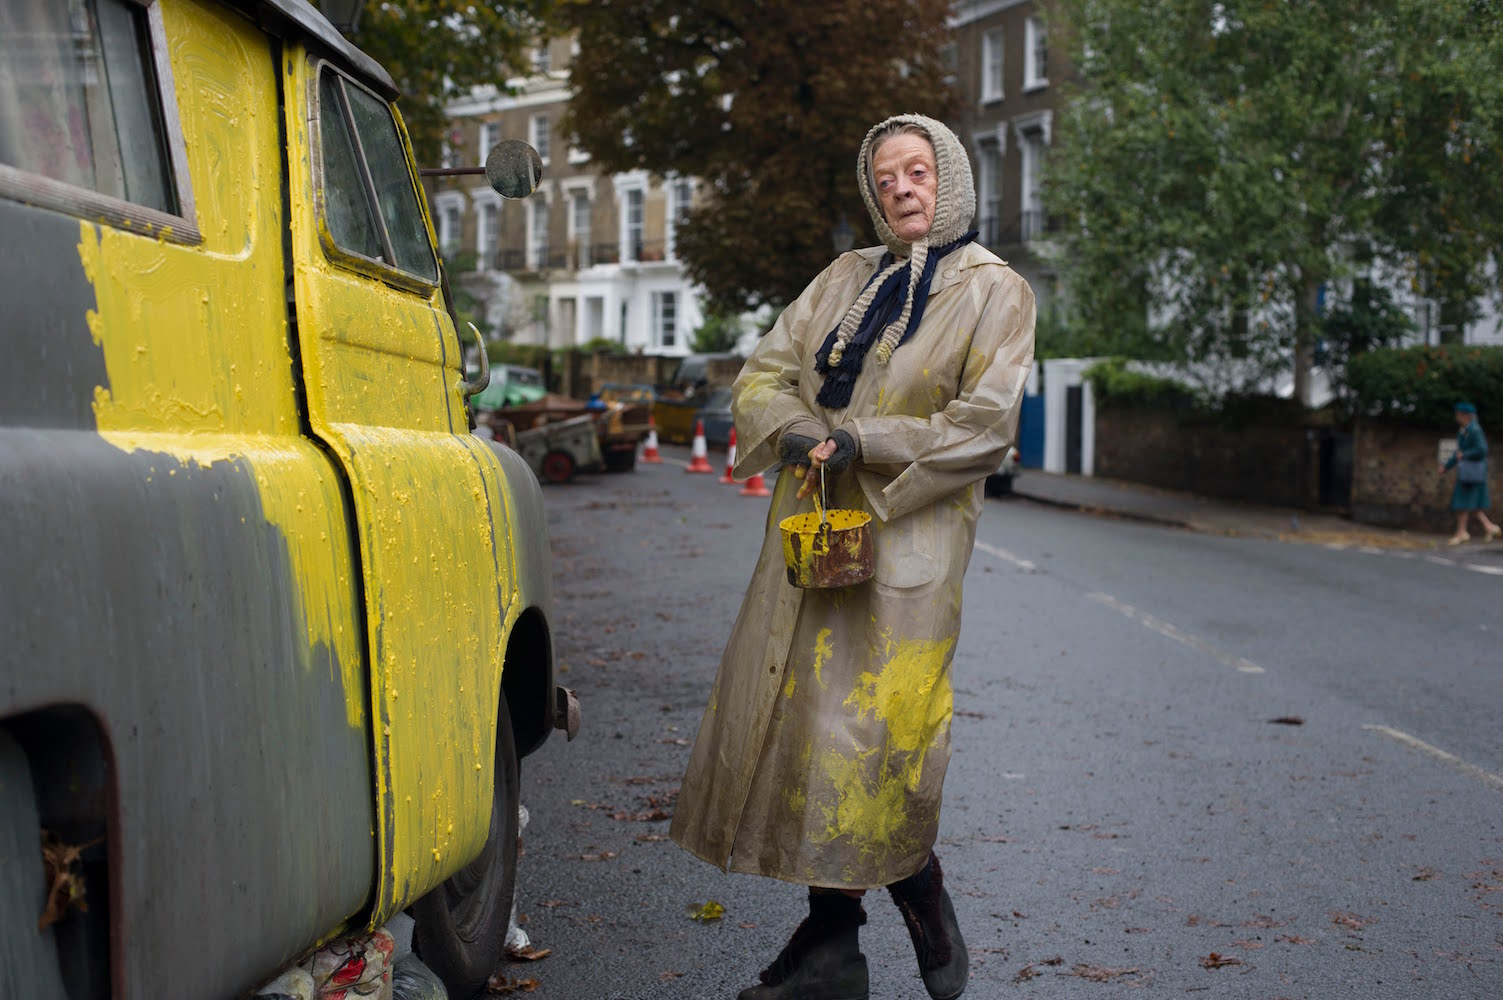 Maggie Smith en The lady in the van